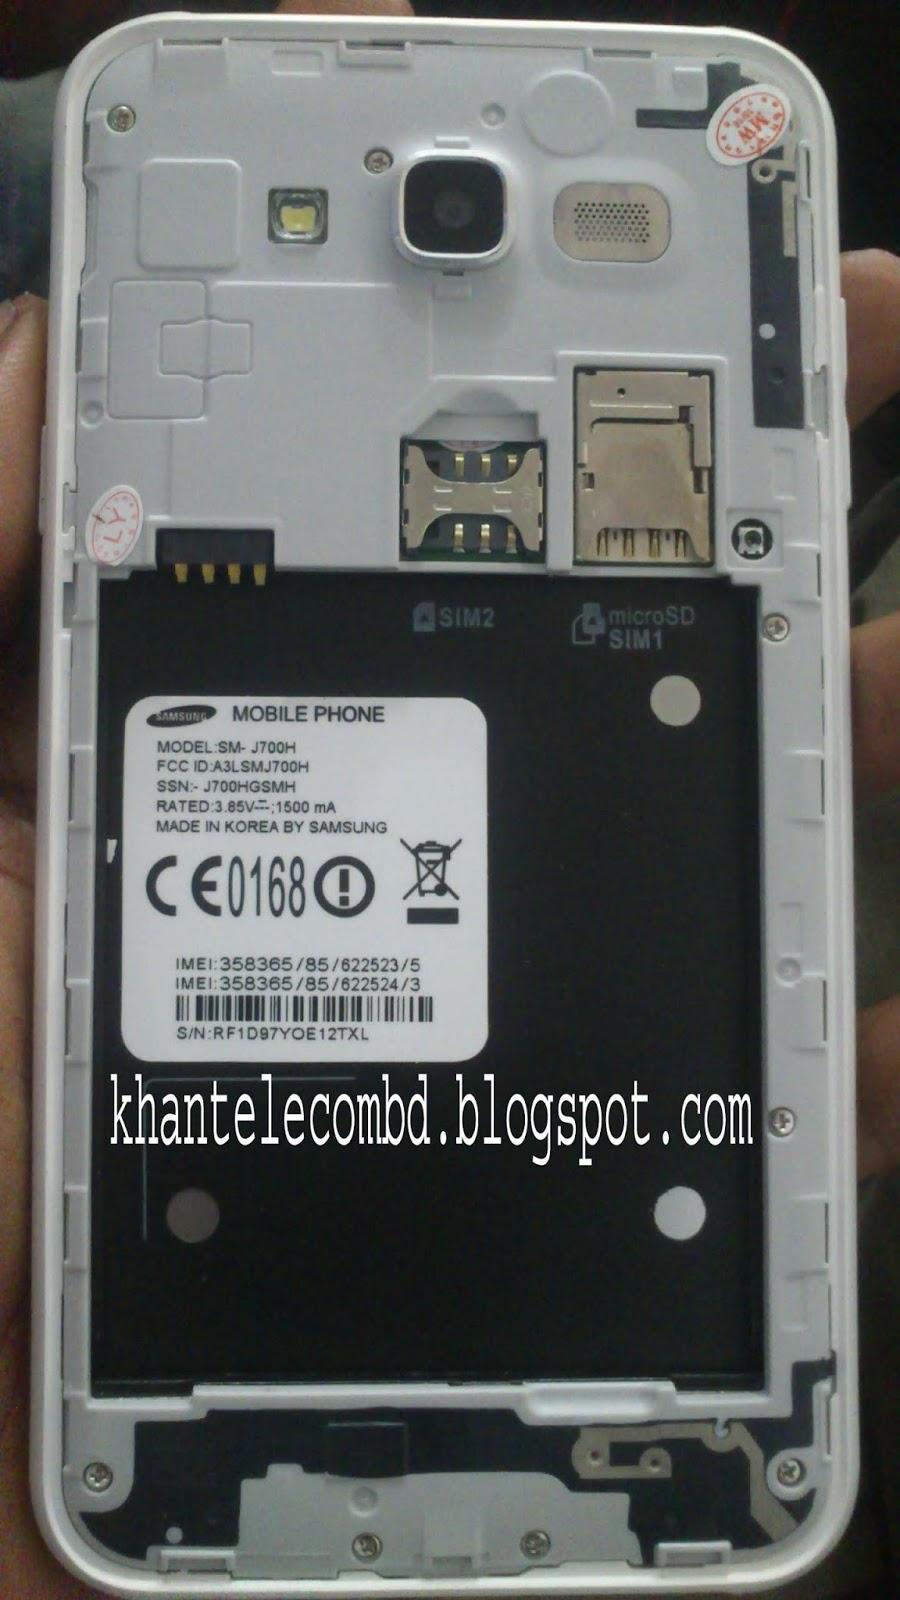 Samsung j700h firmware - Samsung J7 Sm J700h Flash File Mt6572 5 1 1 Lollipop Firmware Bin File 100 Tested By Khan Telecom